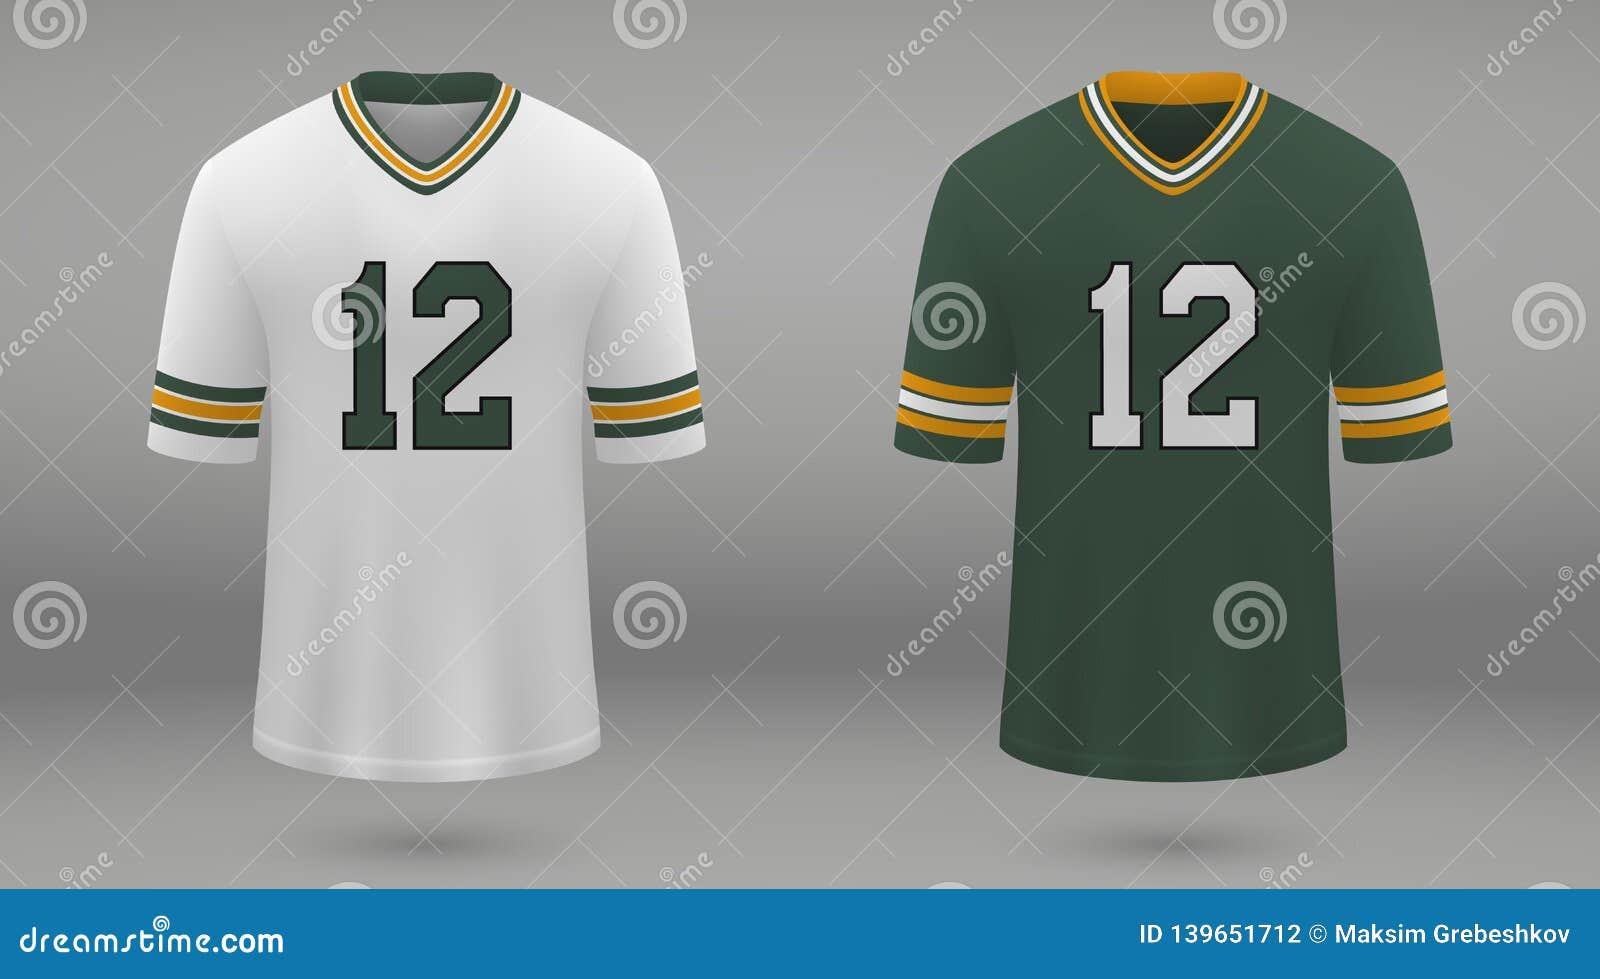 buy popular dfe91 737df Realistic American Football Jersey Stock Illustration ...